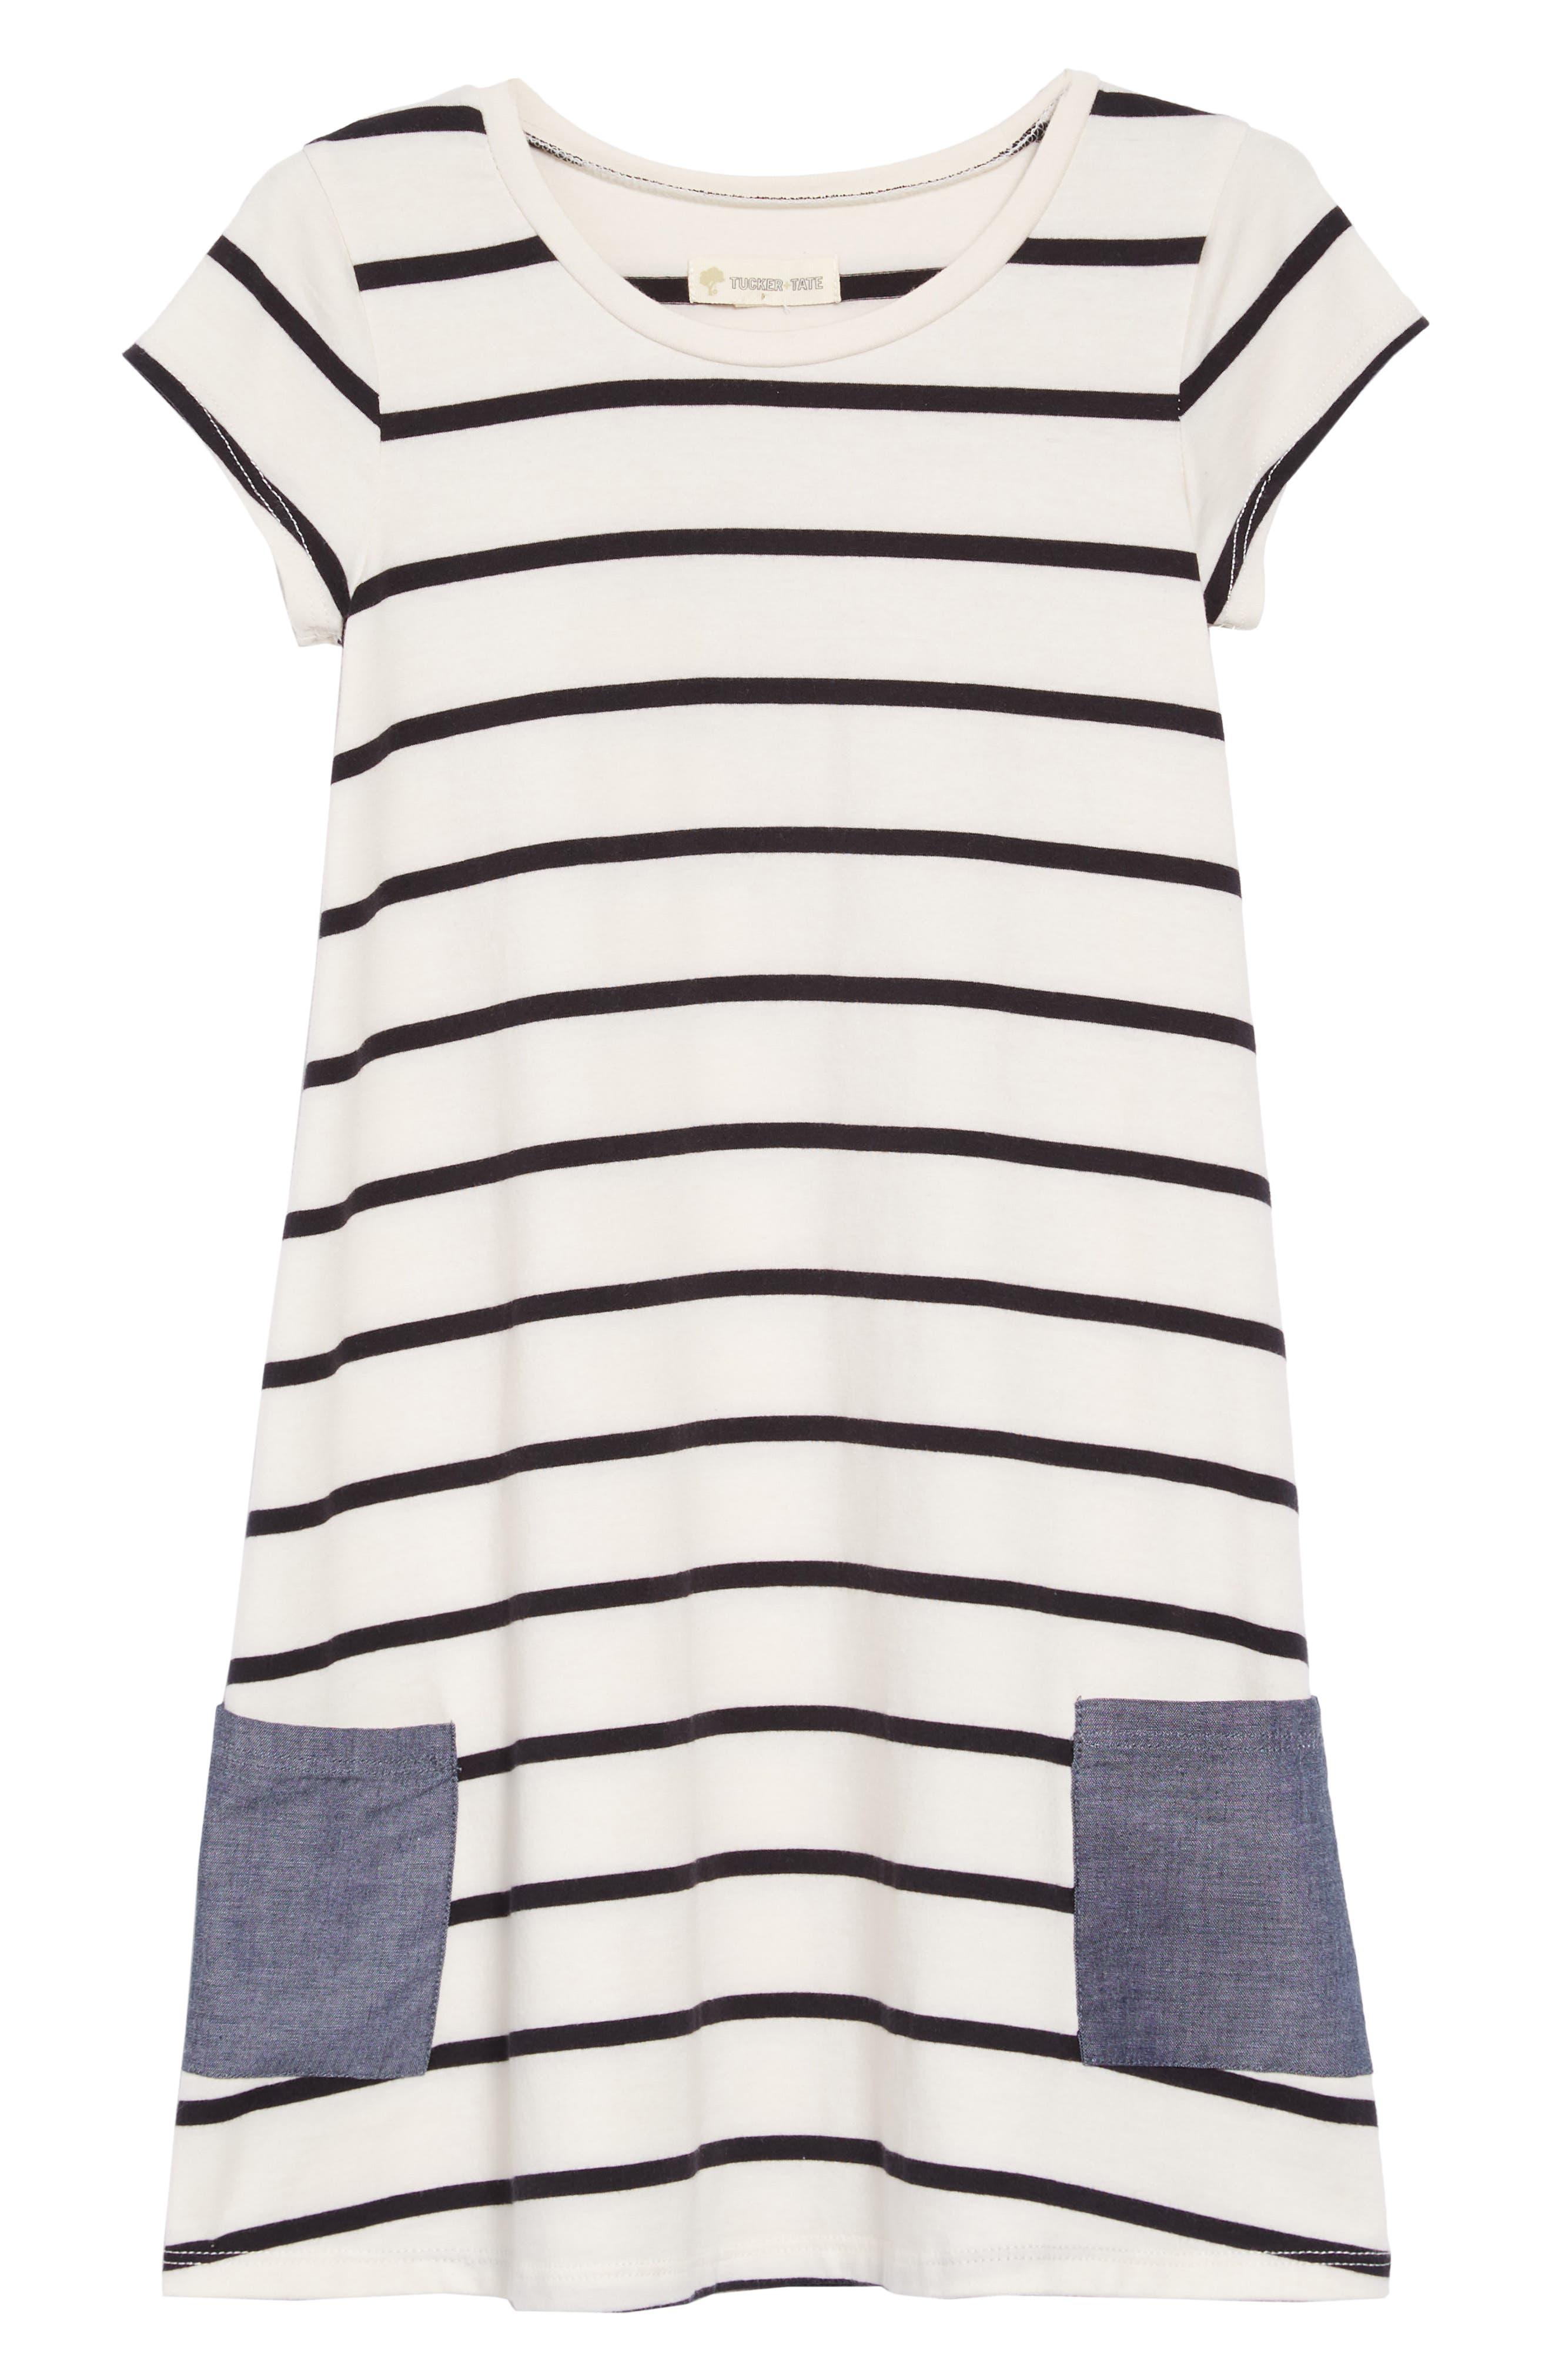 Contrast Pocket T-Shirt Dress,                             Main thumbnail 1, color,                             900